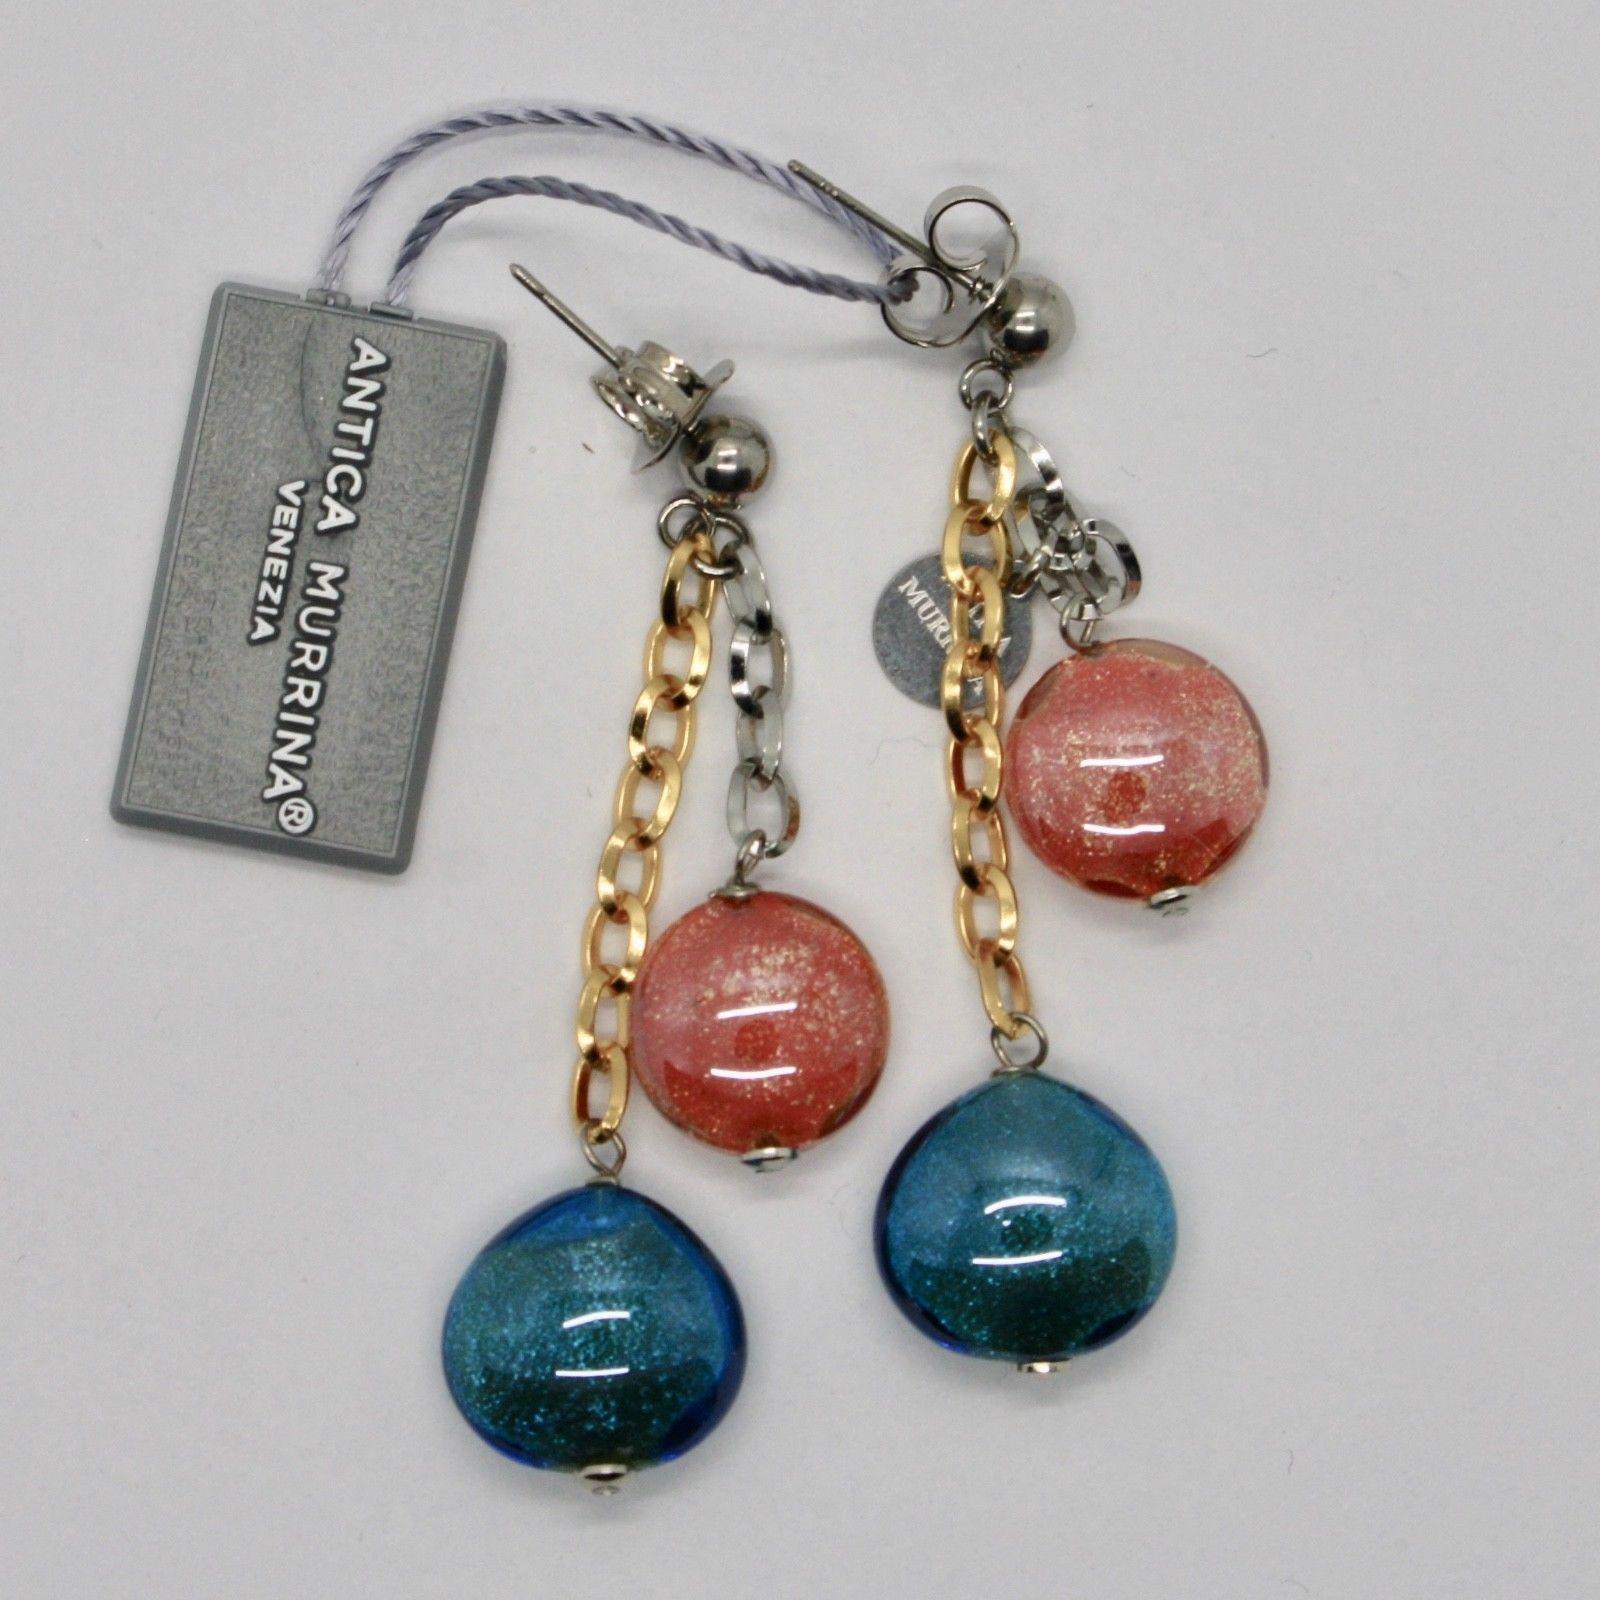 EARRINGS ANTICA MURRINA VENEZIA WITH MURANO GLASS ORANGE AND BLUE OR590A19